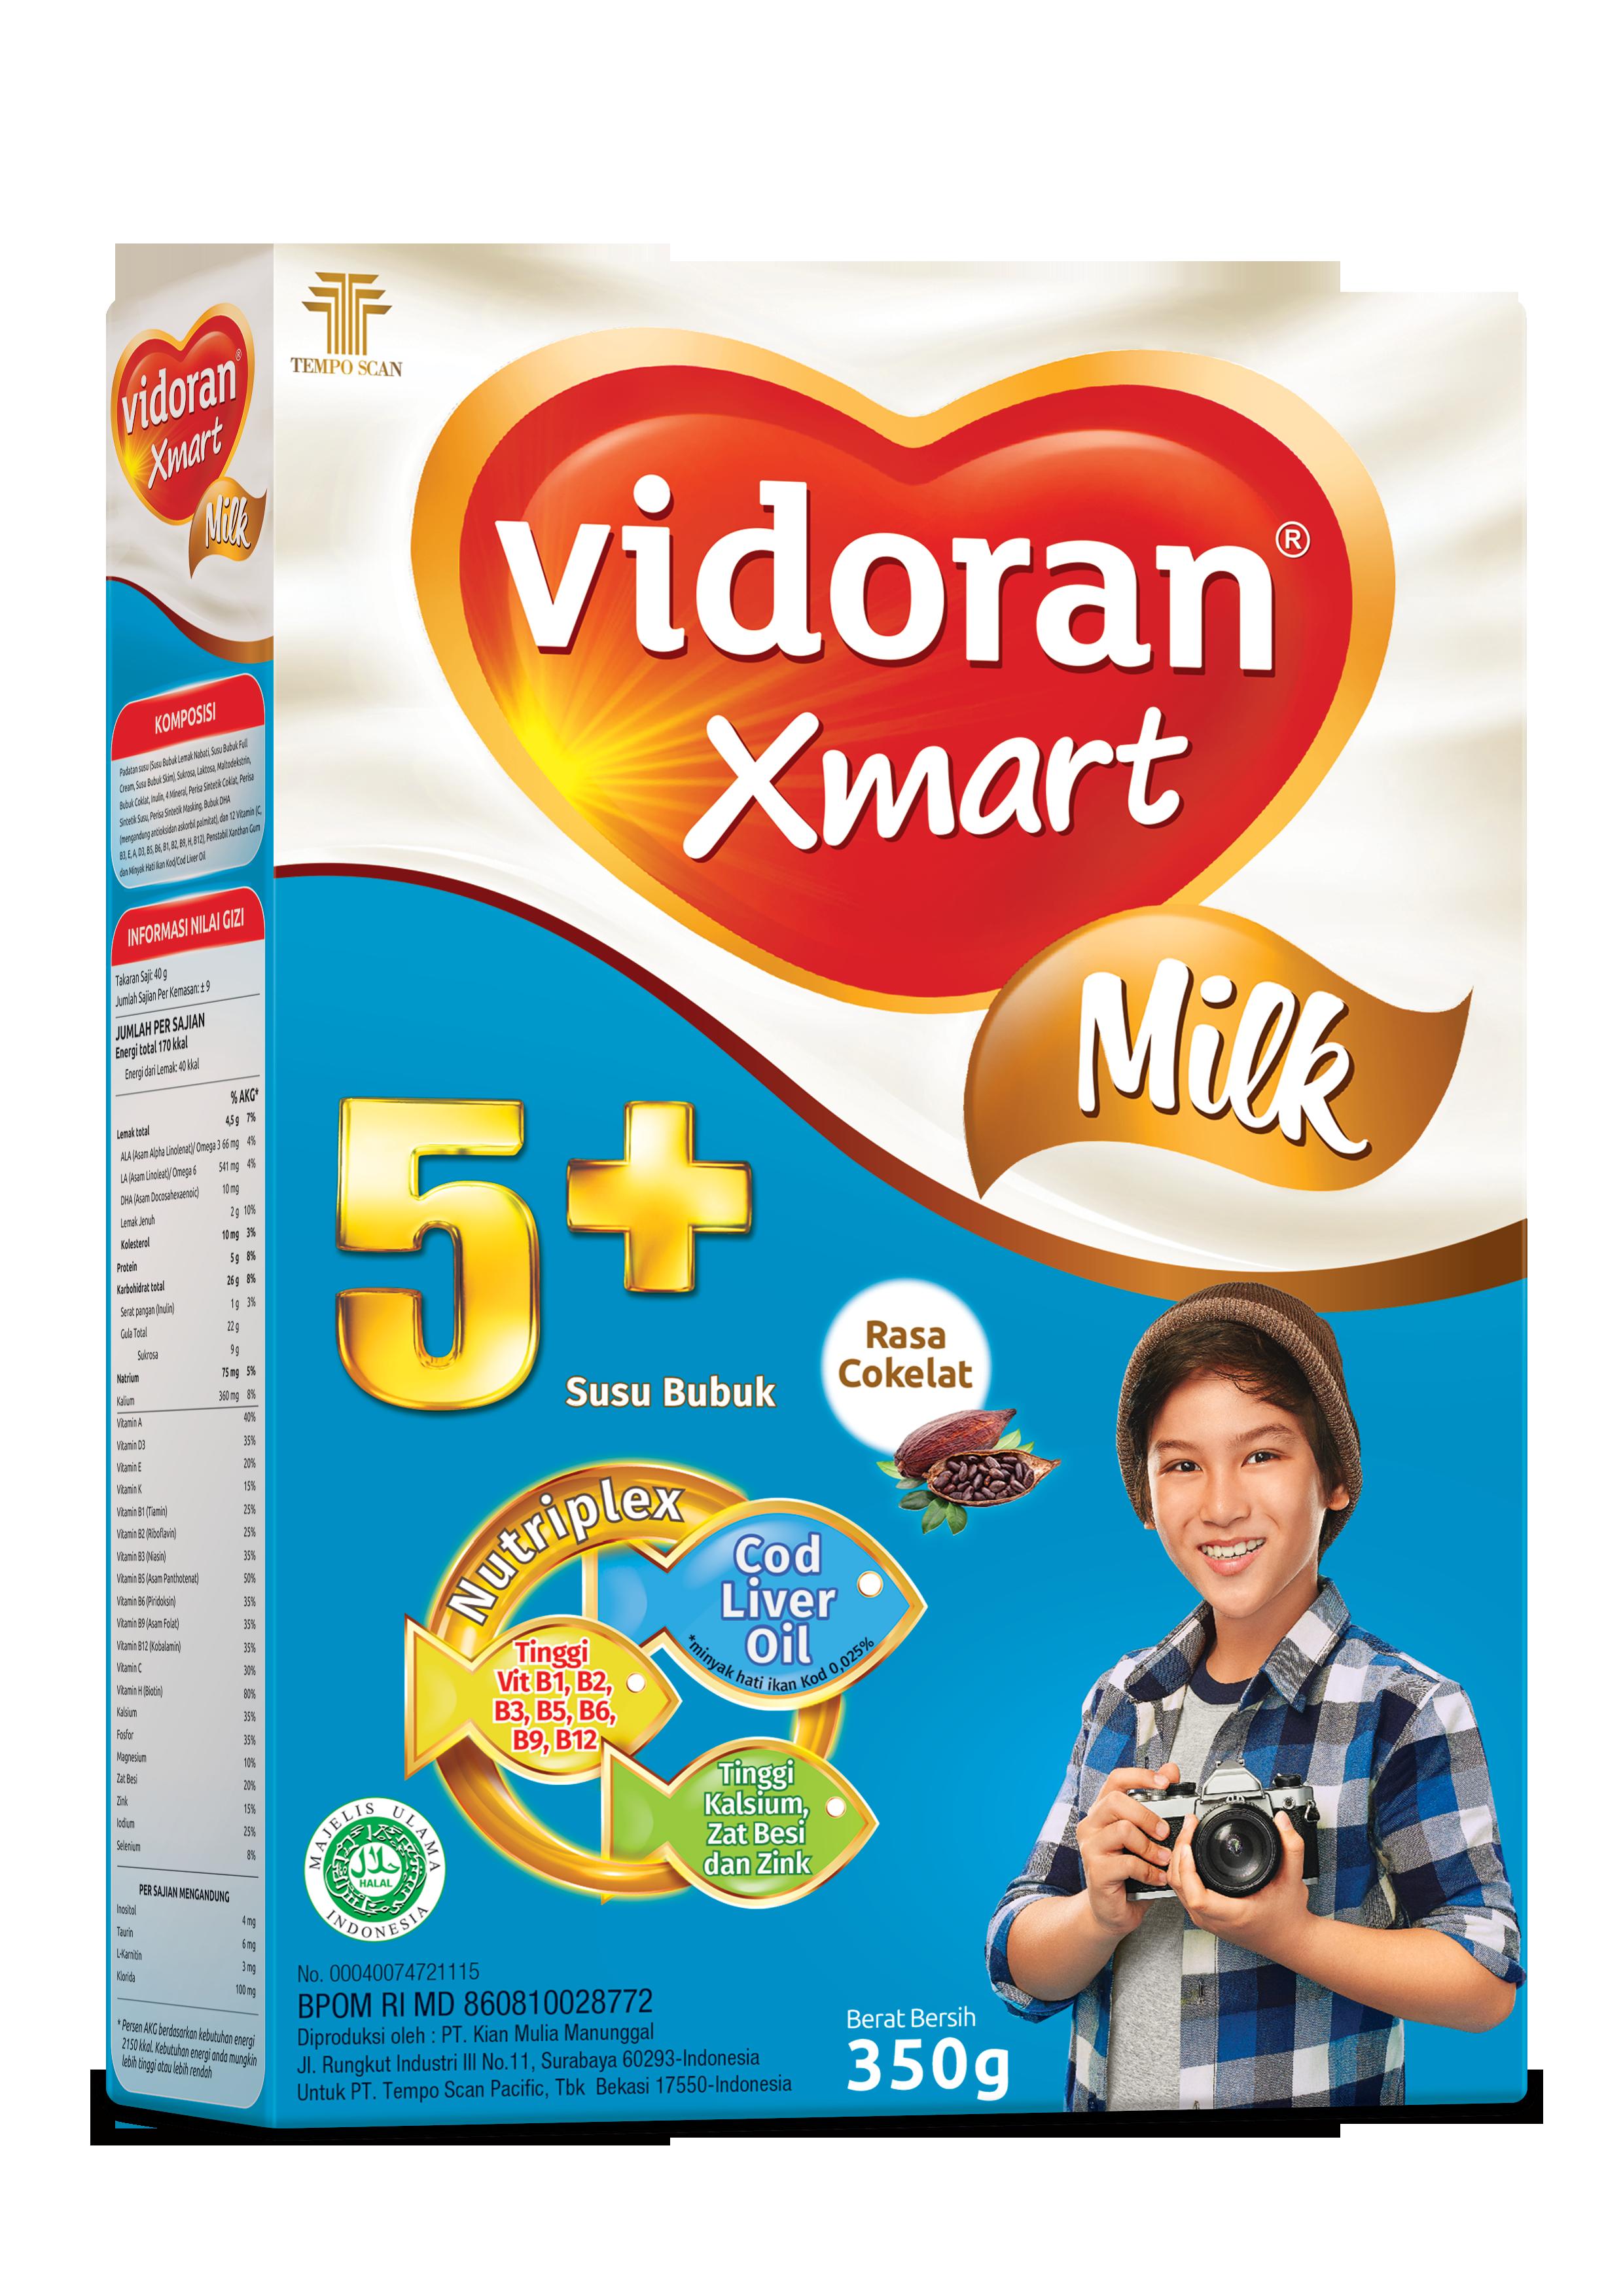 Susu vidoran Xmart 5+ Rasa Coklat